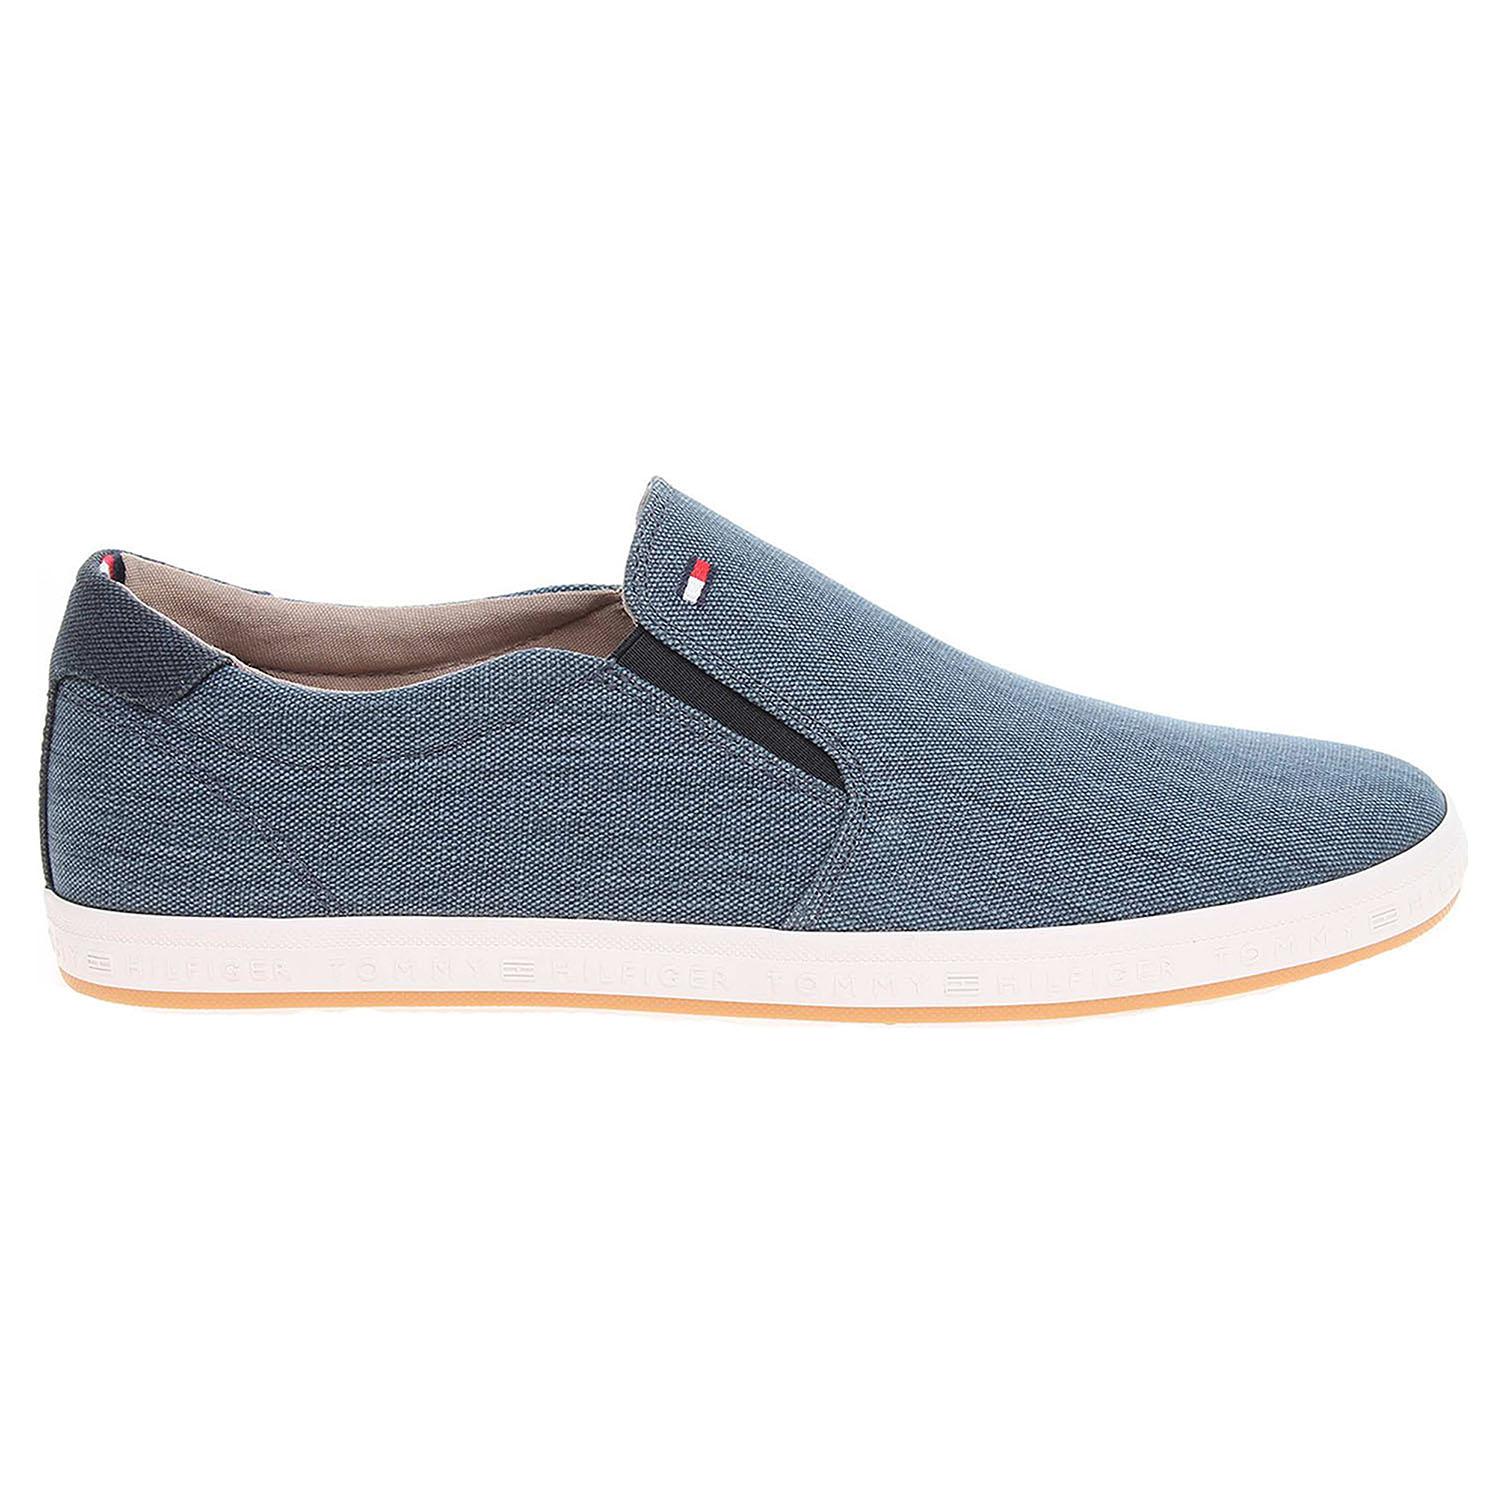 Ecco Tommy Hilfiger pánská obuv FM0FM00409 H2285OWELL jeans 24000455 6a14bdb9f46